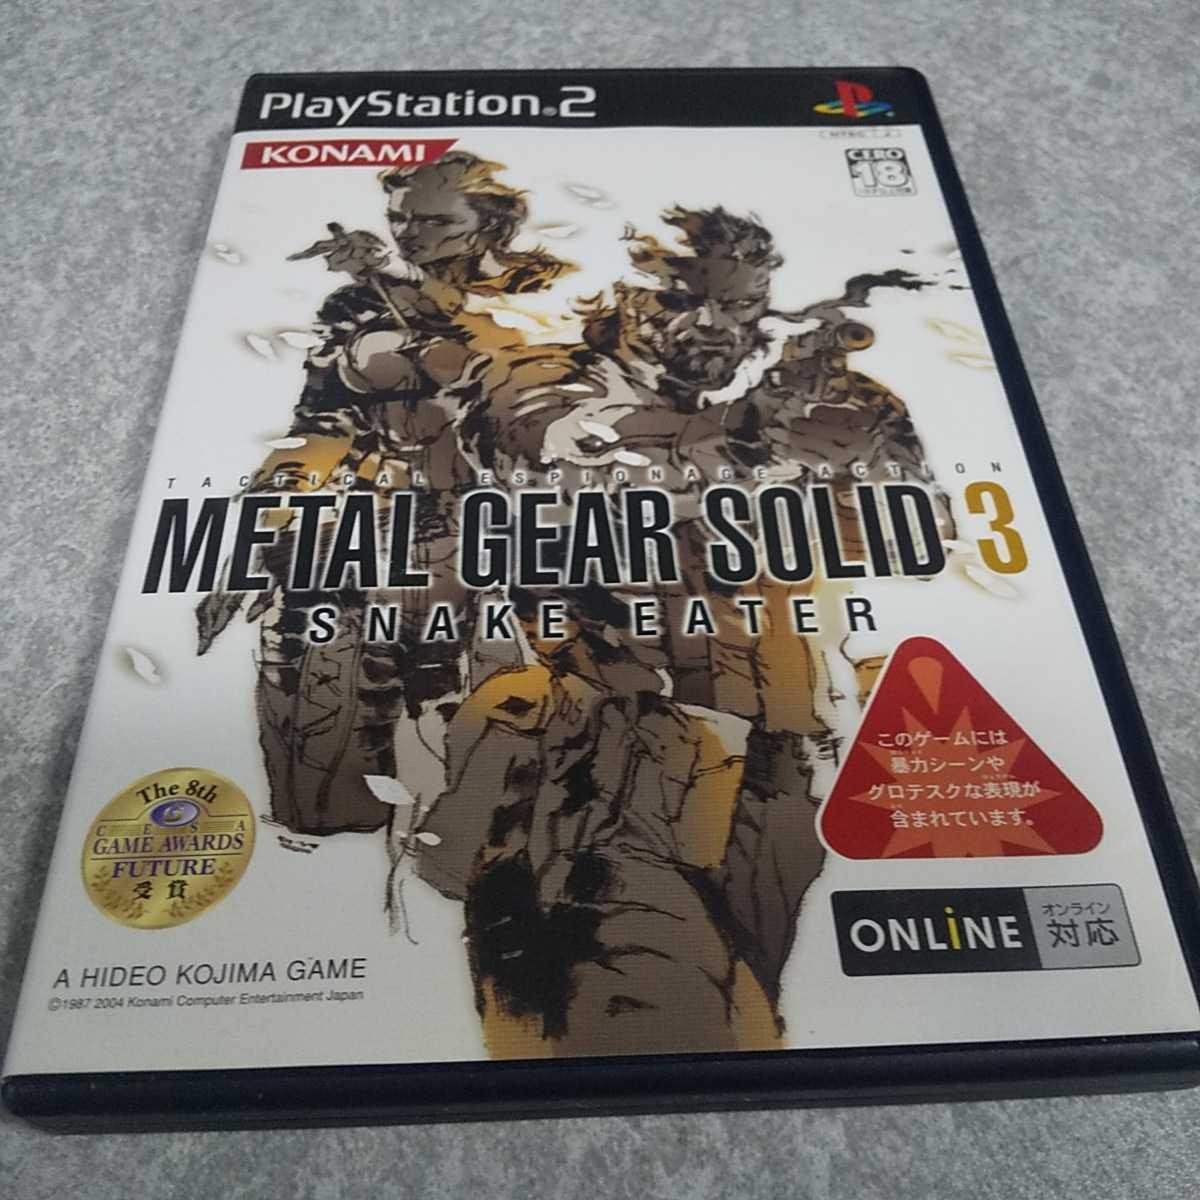 PS2【メタルギアソリッド3】コナミ 説明書なし [送料無料]返金保証あり